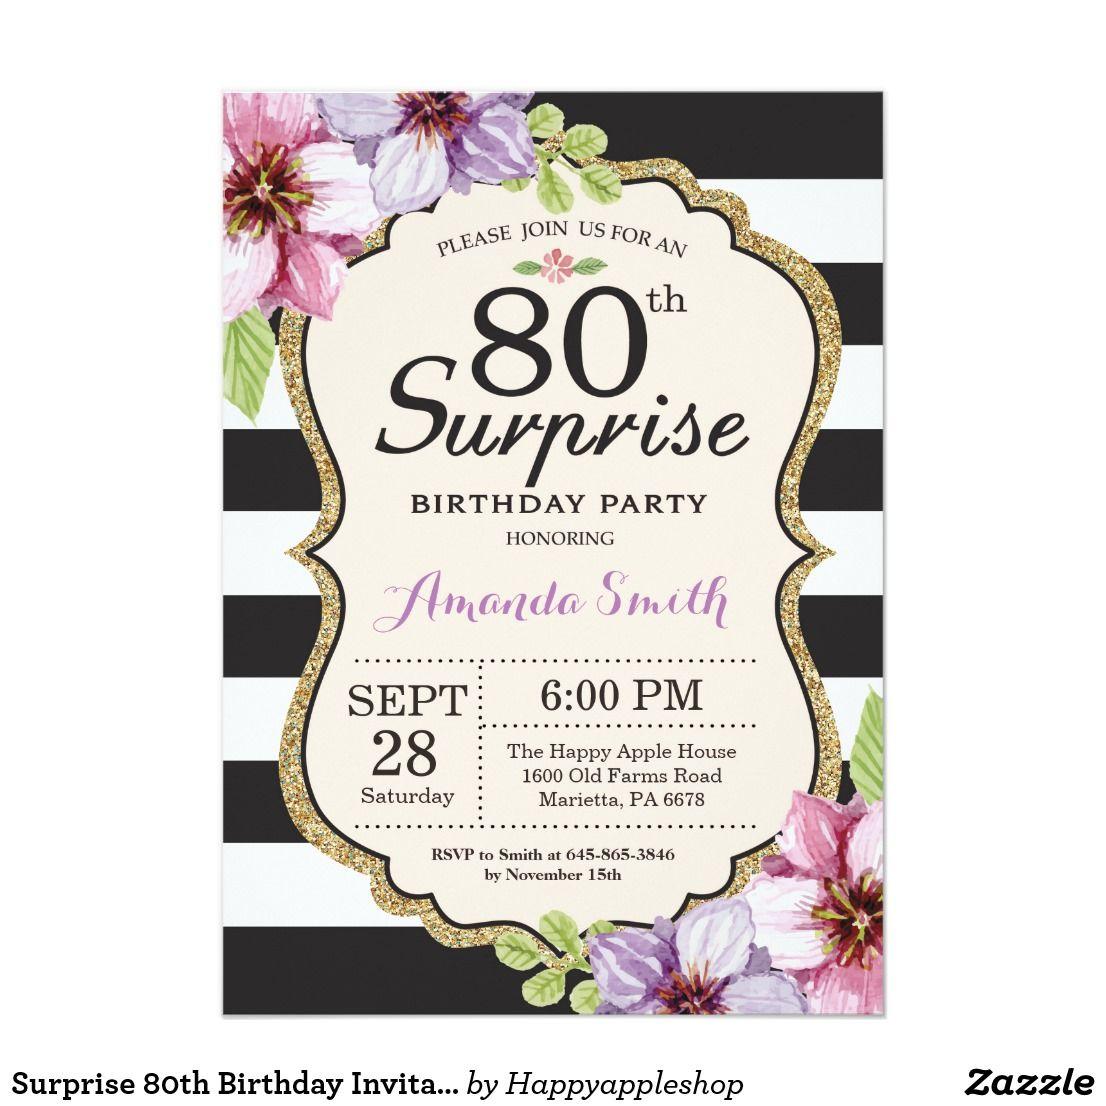 Surprise 80th Birthday Invitation Women Floral Birthday